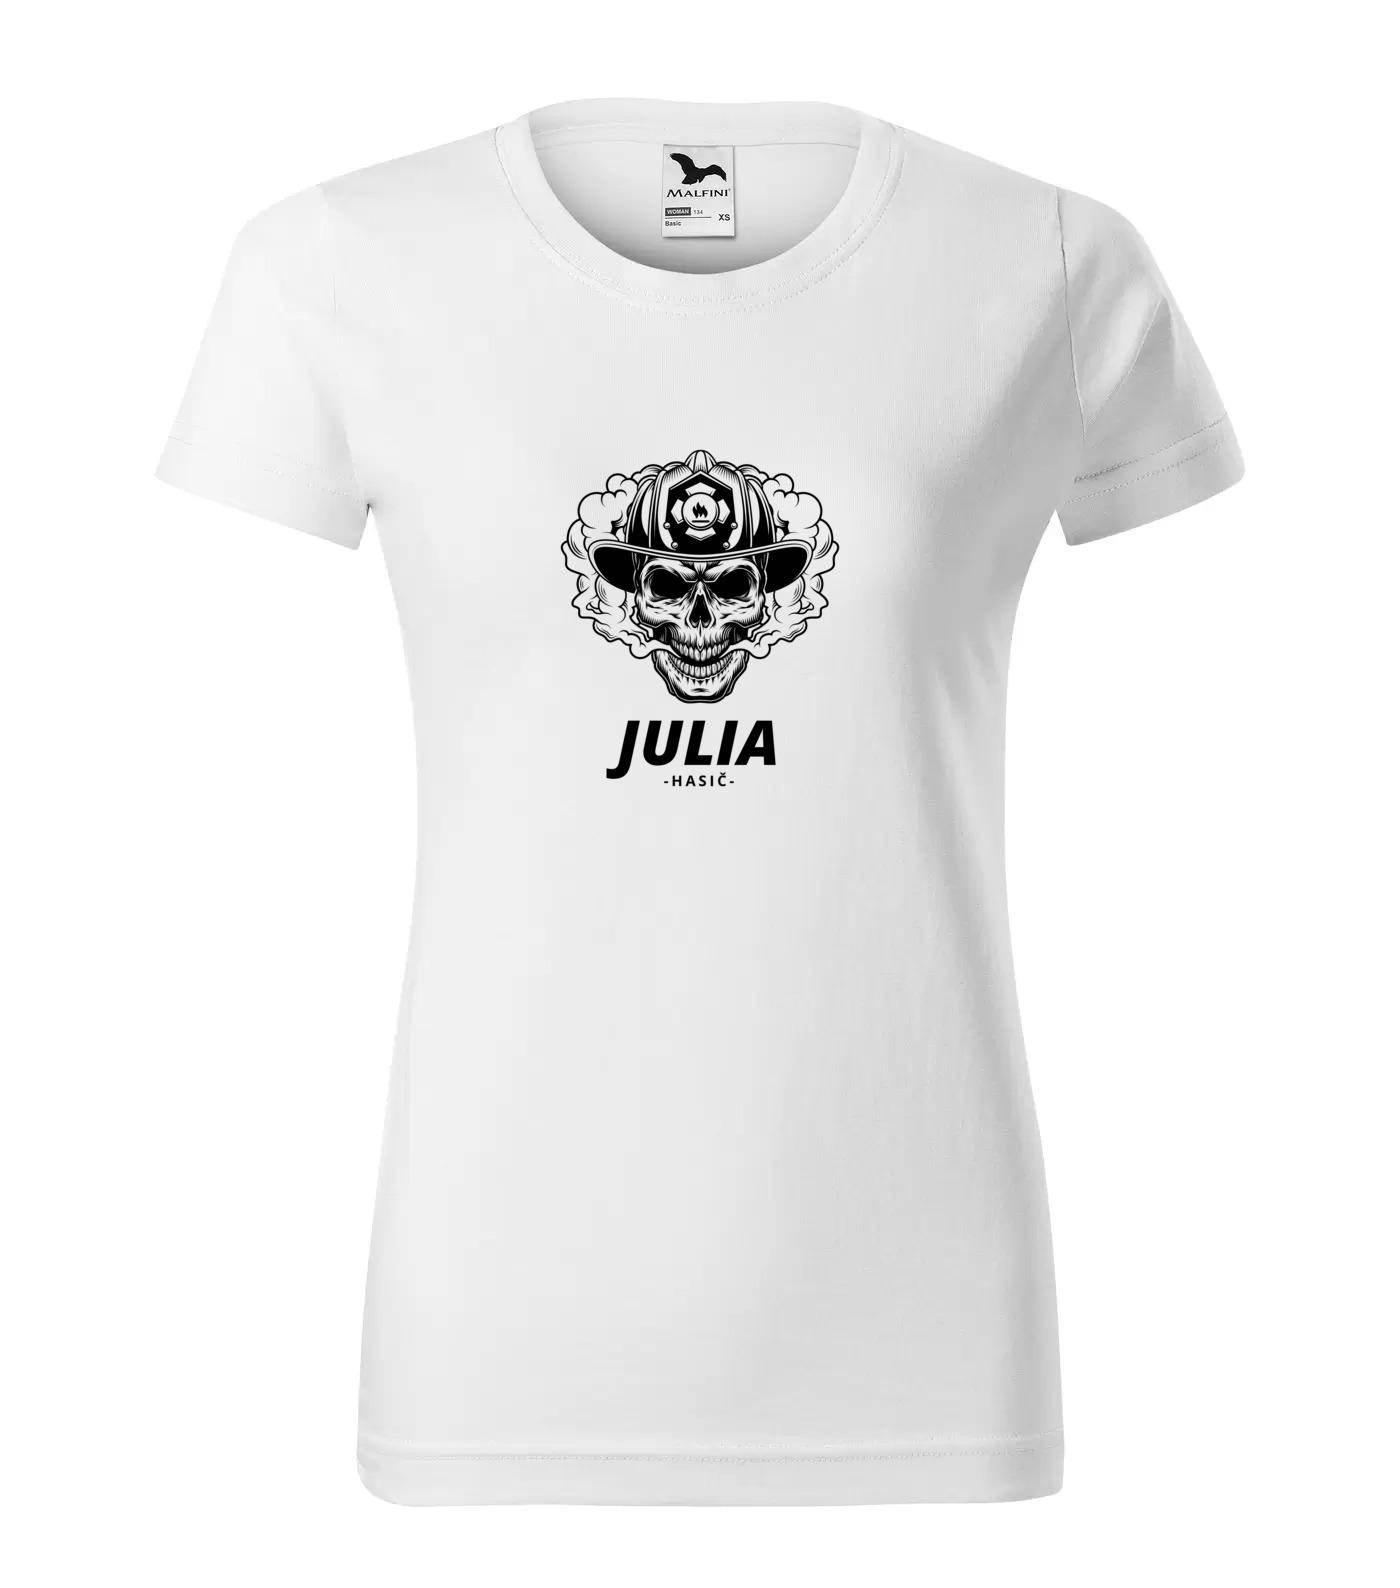 Tričko Hasič Julia